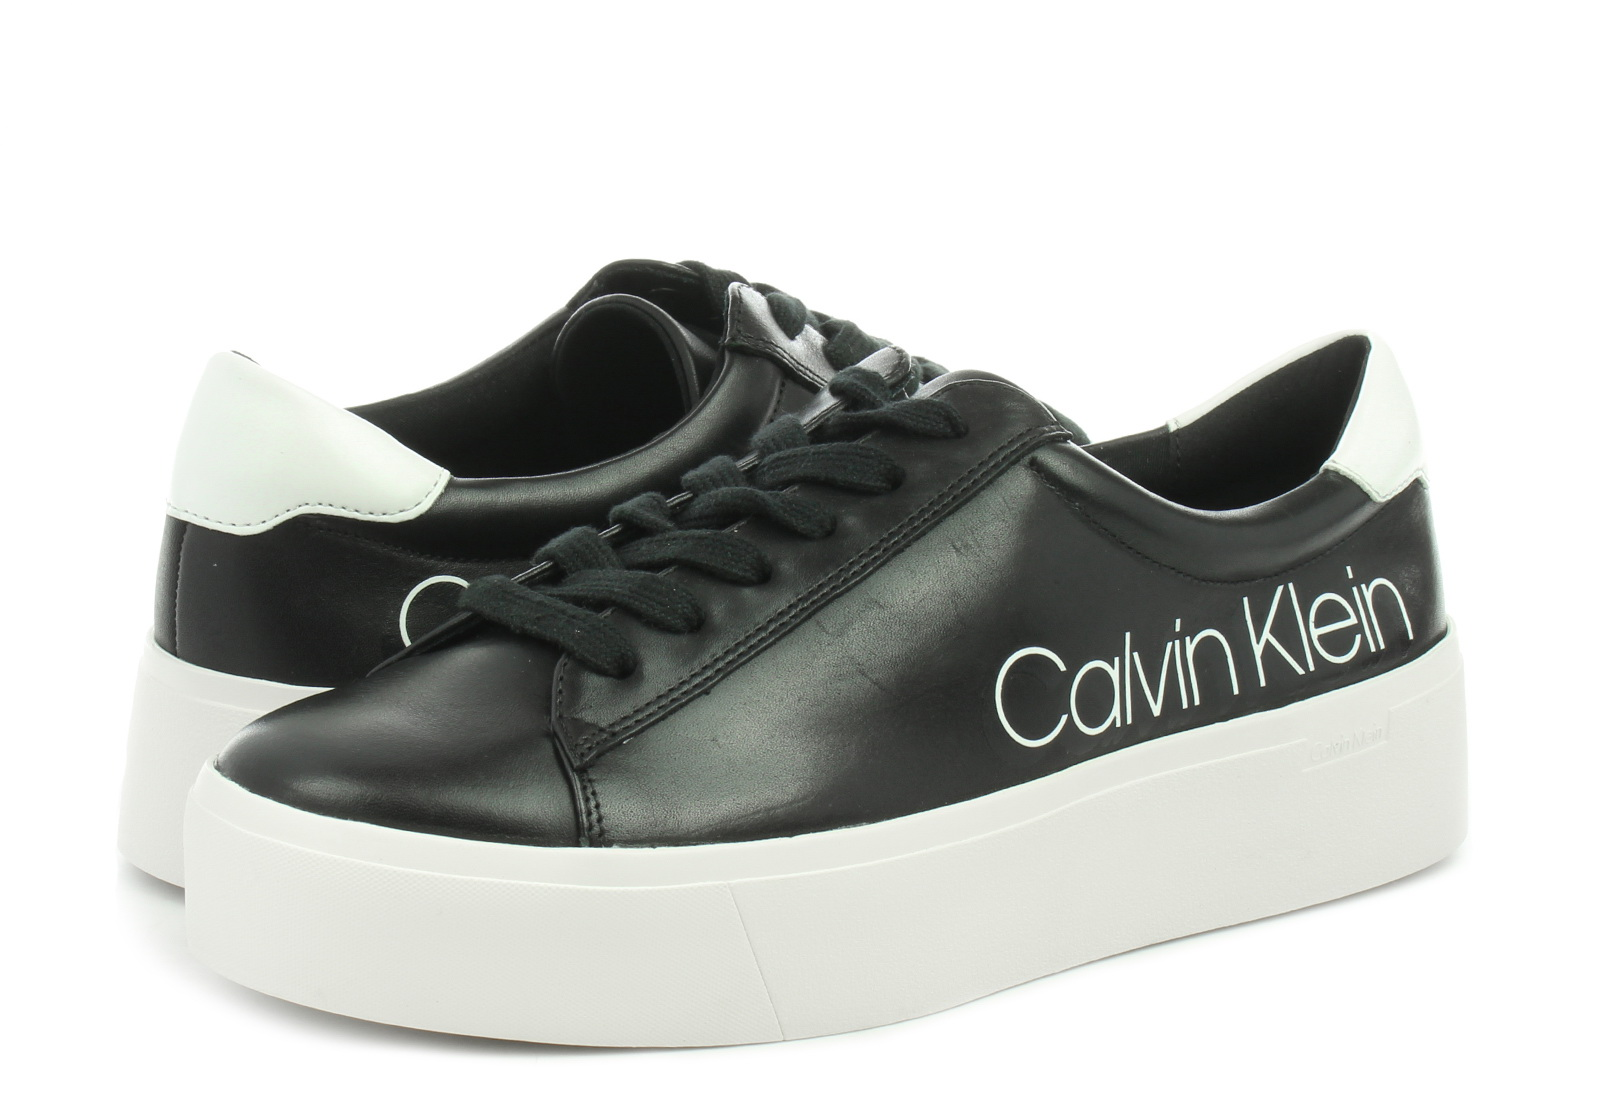 Buty damskie Producent: Calvin Klein, ceny, opinie, sklepy